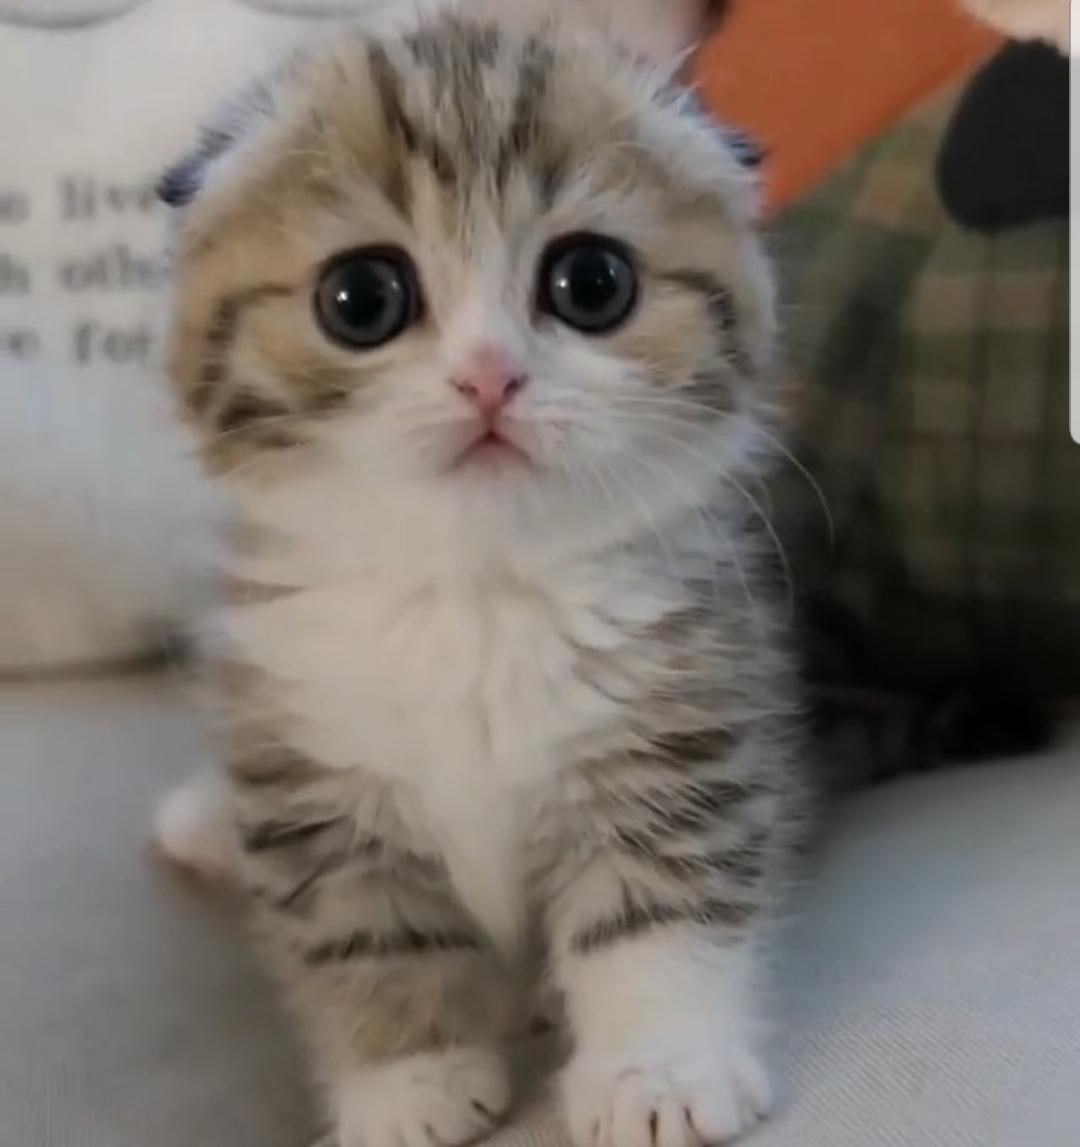 Kitten Mittenshttps I Redd It 0j3g54bhsyu11 Jpg Cute Baby Cats Cute Little Kittens Kittens Cutest